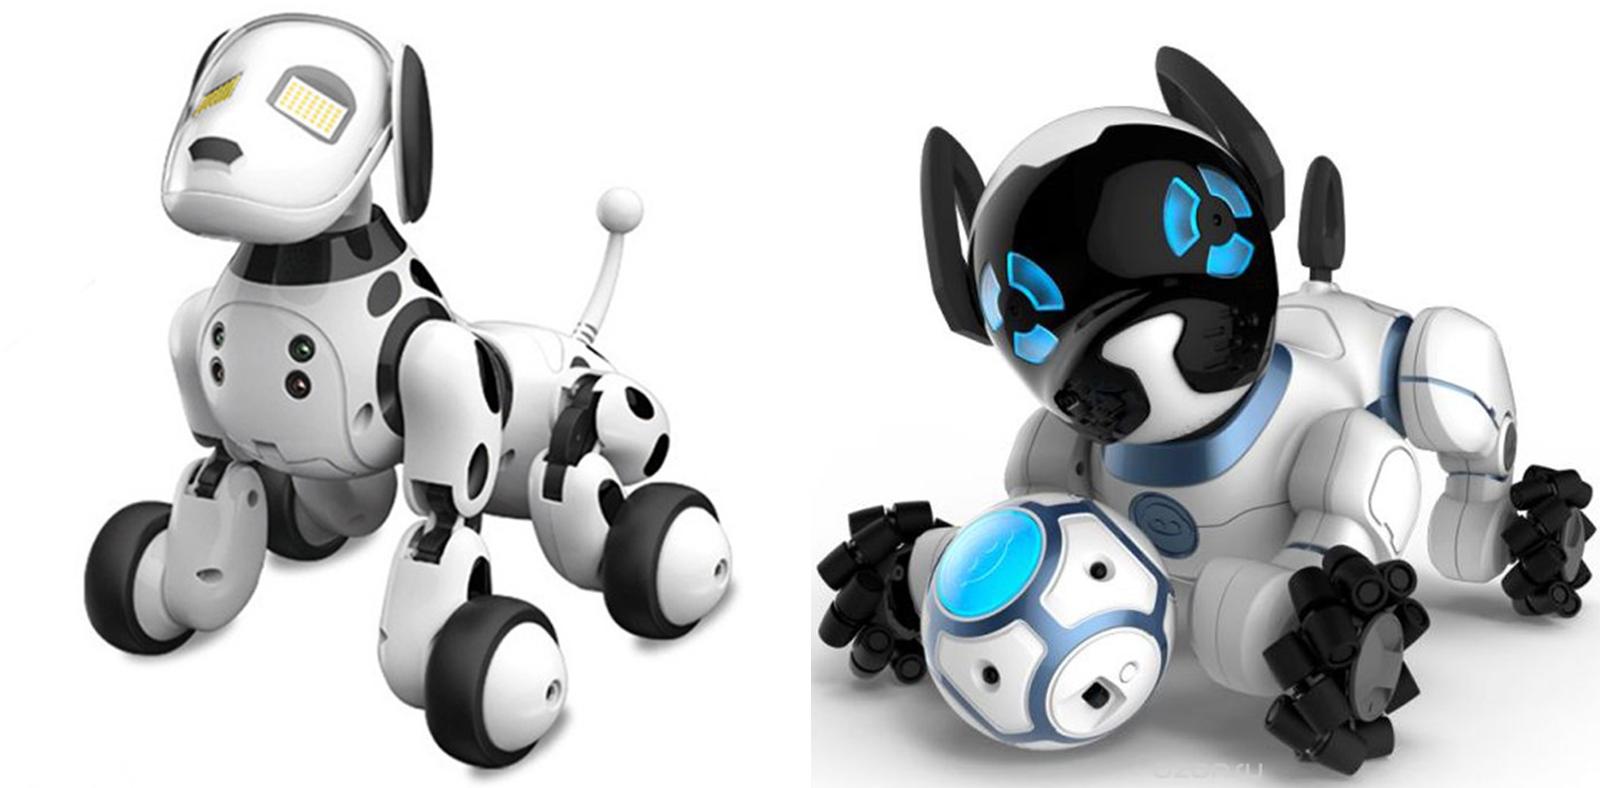 Слева — оригинал: интерактивная игрушка «Робот-собачка Чип» за 20 160<span class=ruble>Р</span>. Справа — аналог чуть дороже 2 000<span class=ruble>Р</span>